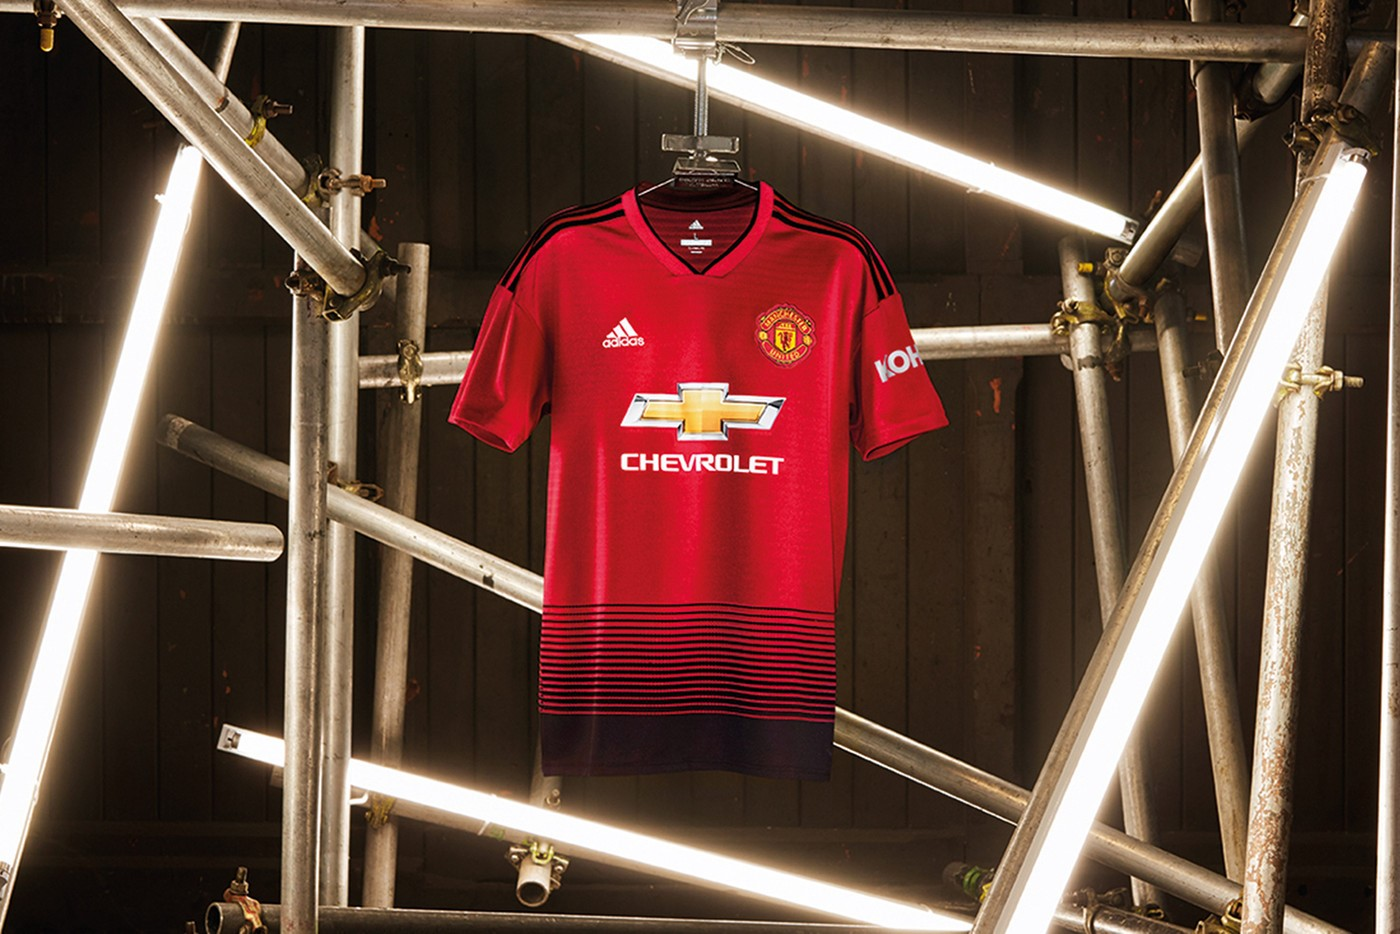 Desain Jersey Adidas Untuk Manchester United Musim 2018 2019